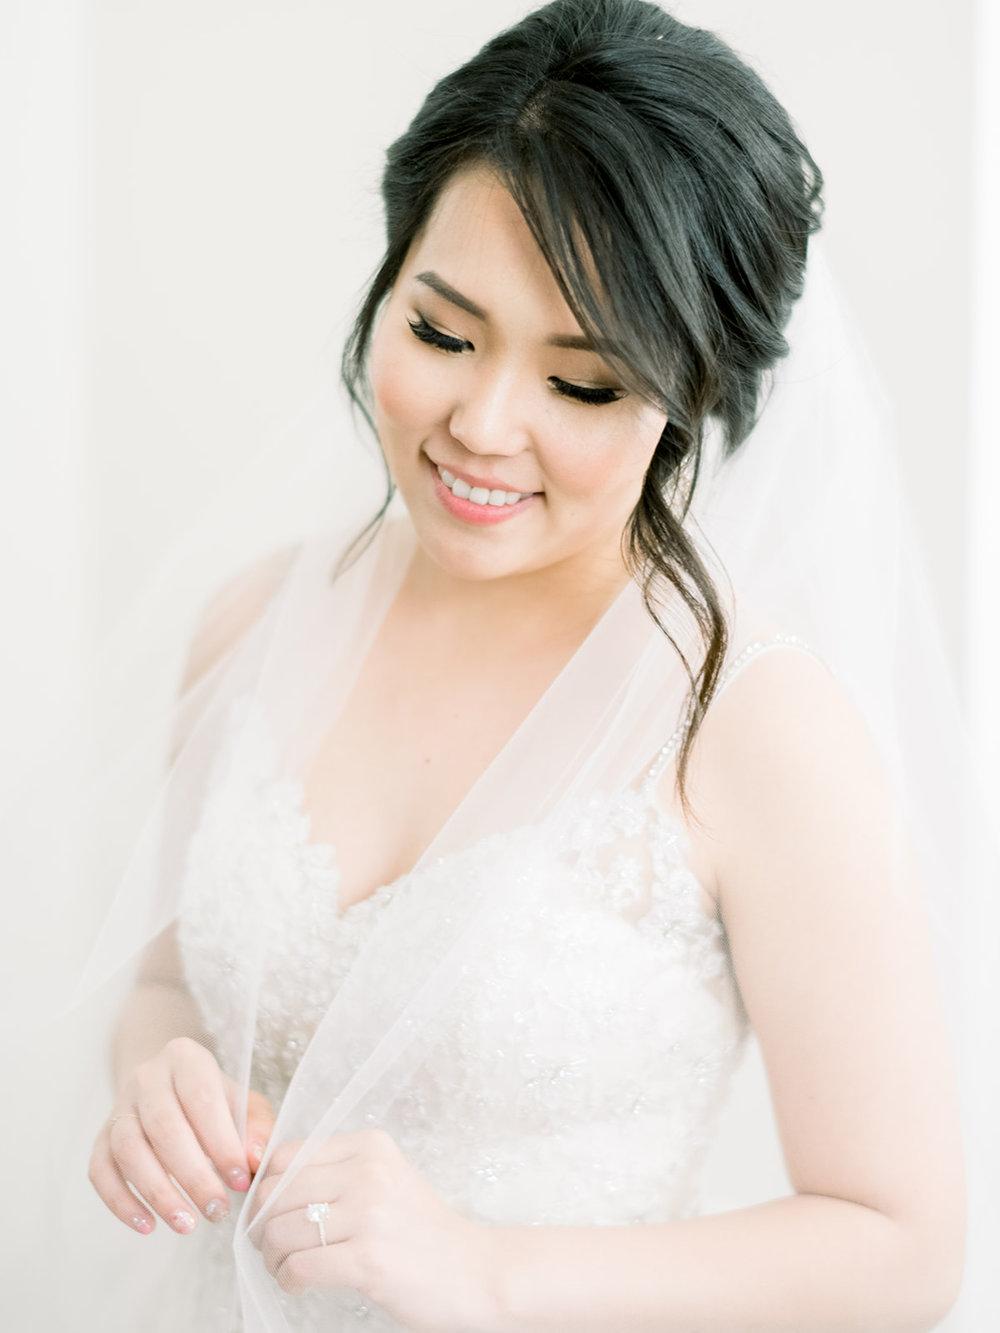 jueunandjon-etherandsmith-wedding-629.jpg